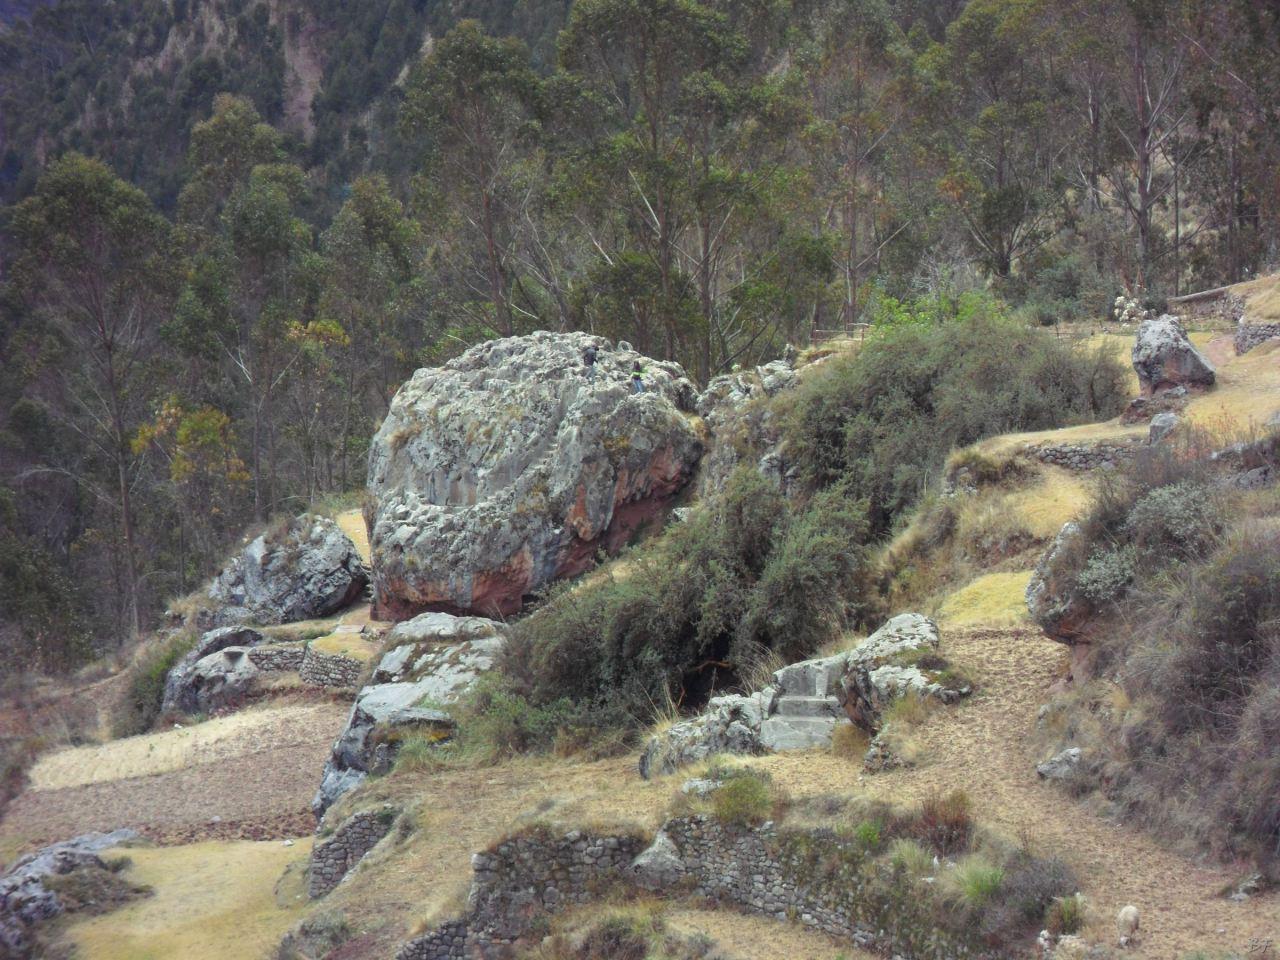 Chinchero-Mura-Poligonali-Piramide-Urubamba-Peru-78